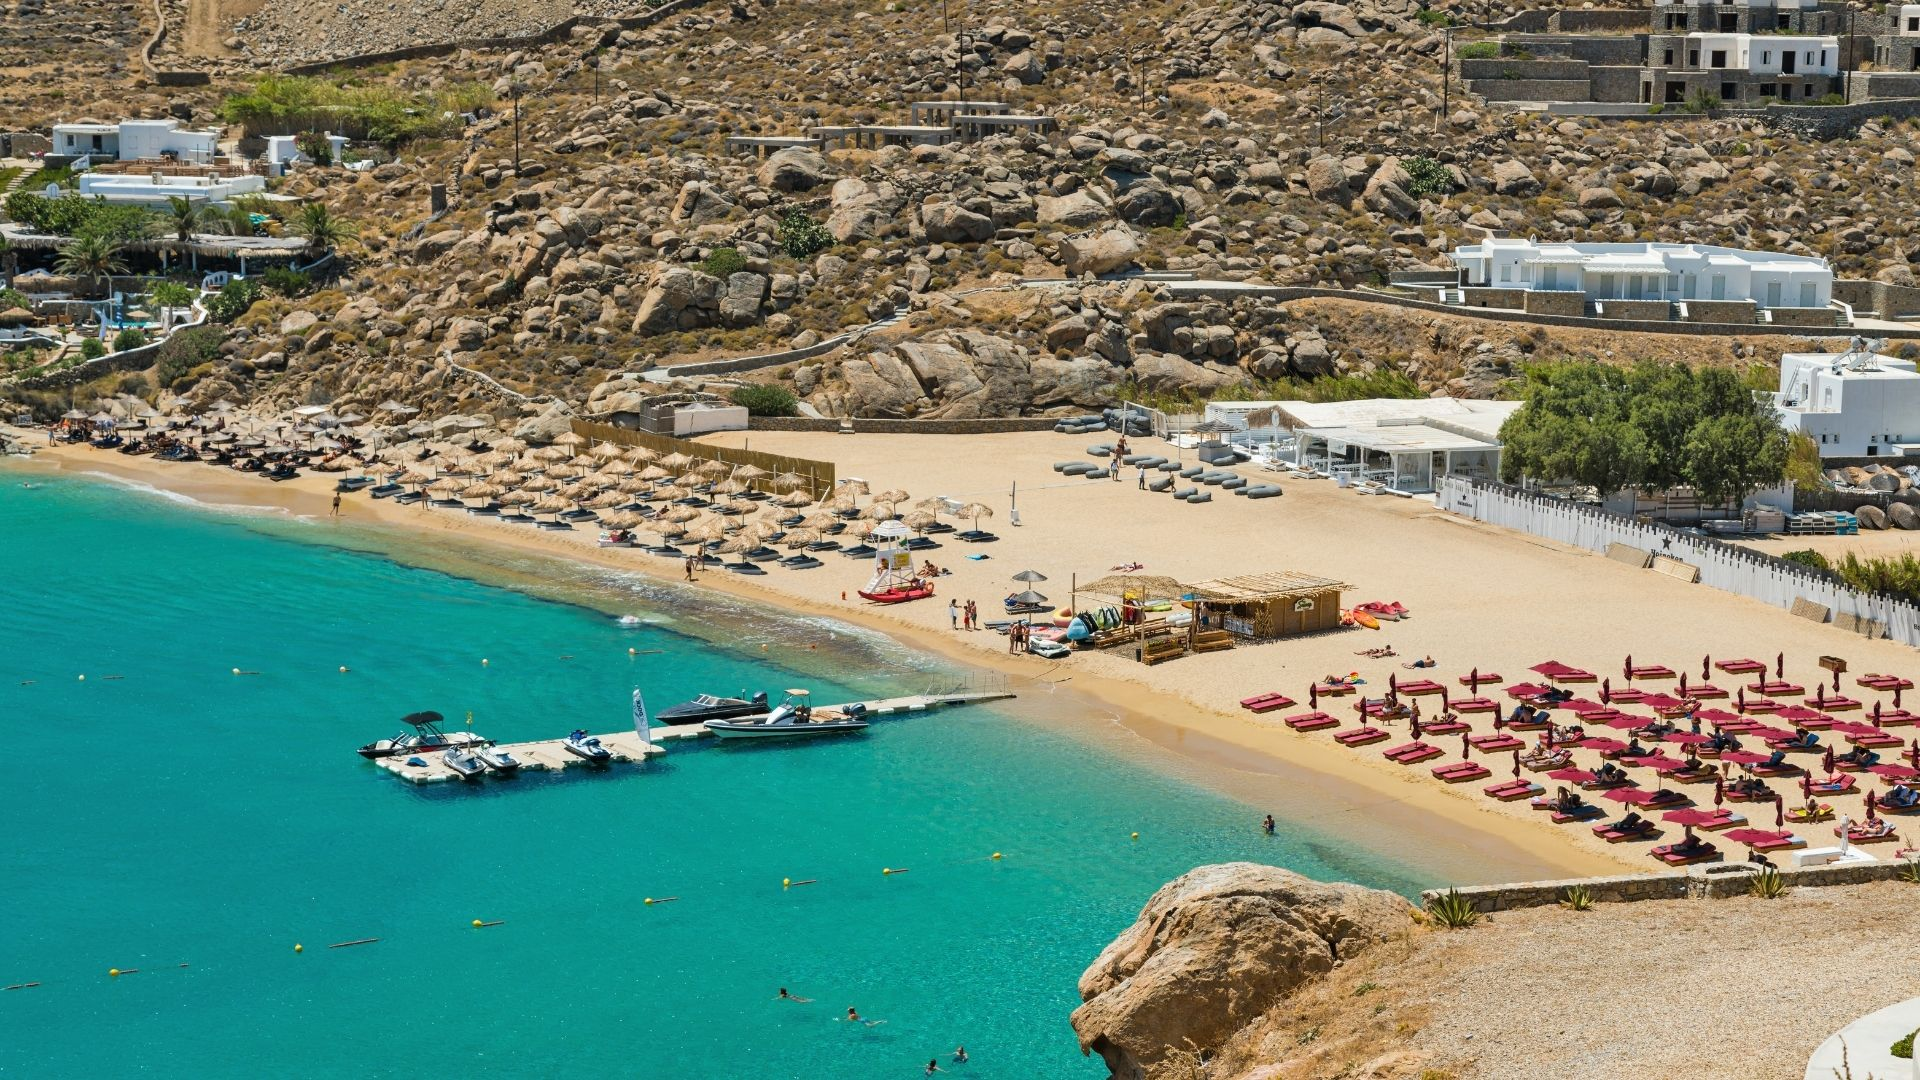 The famous Super Pradise beach